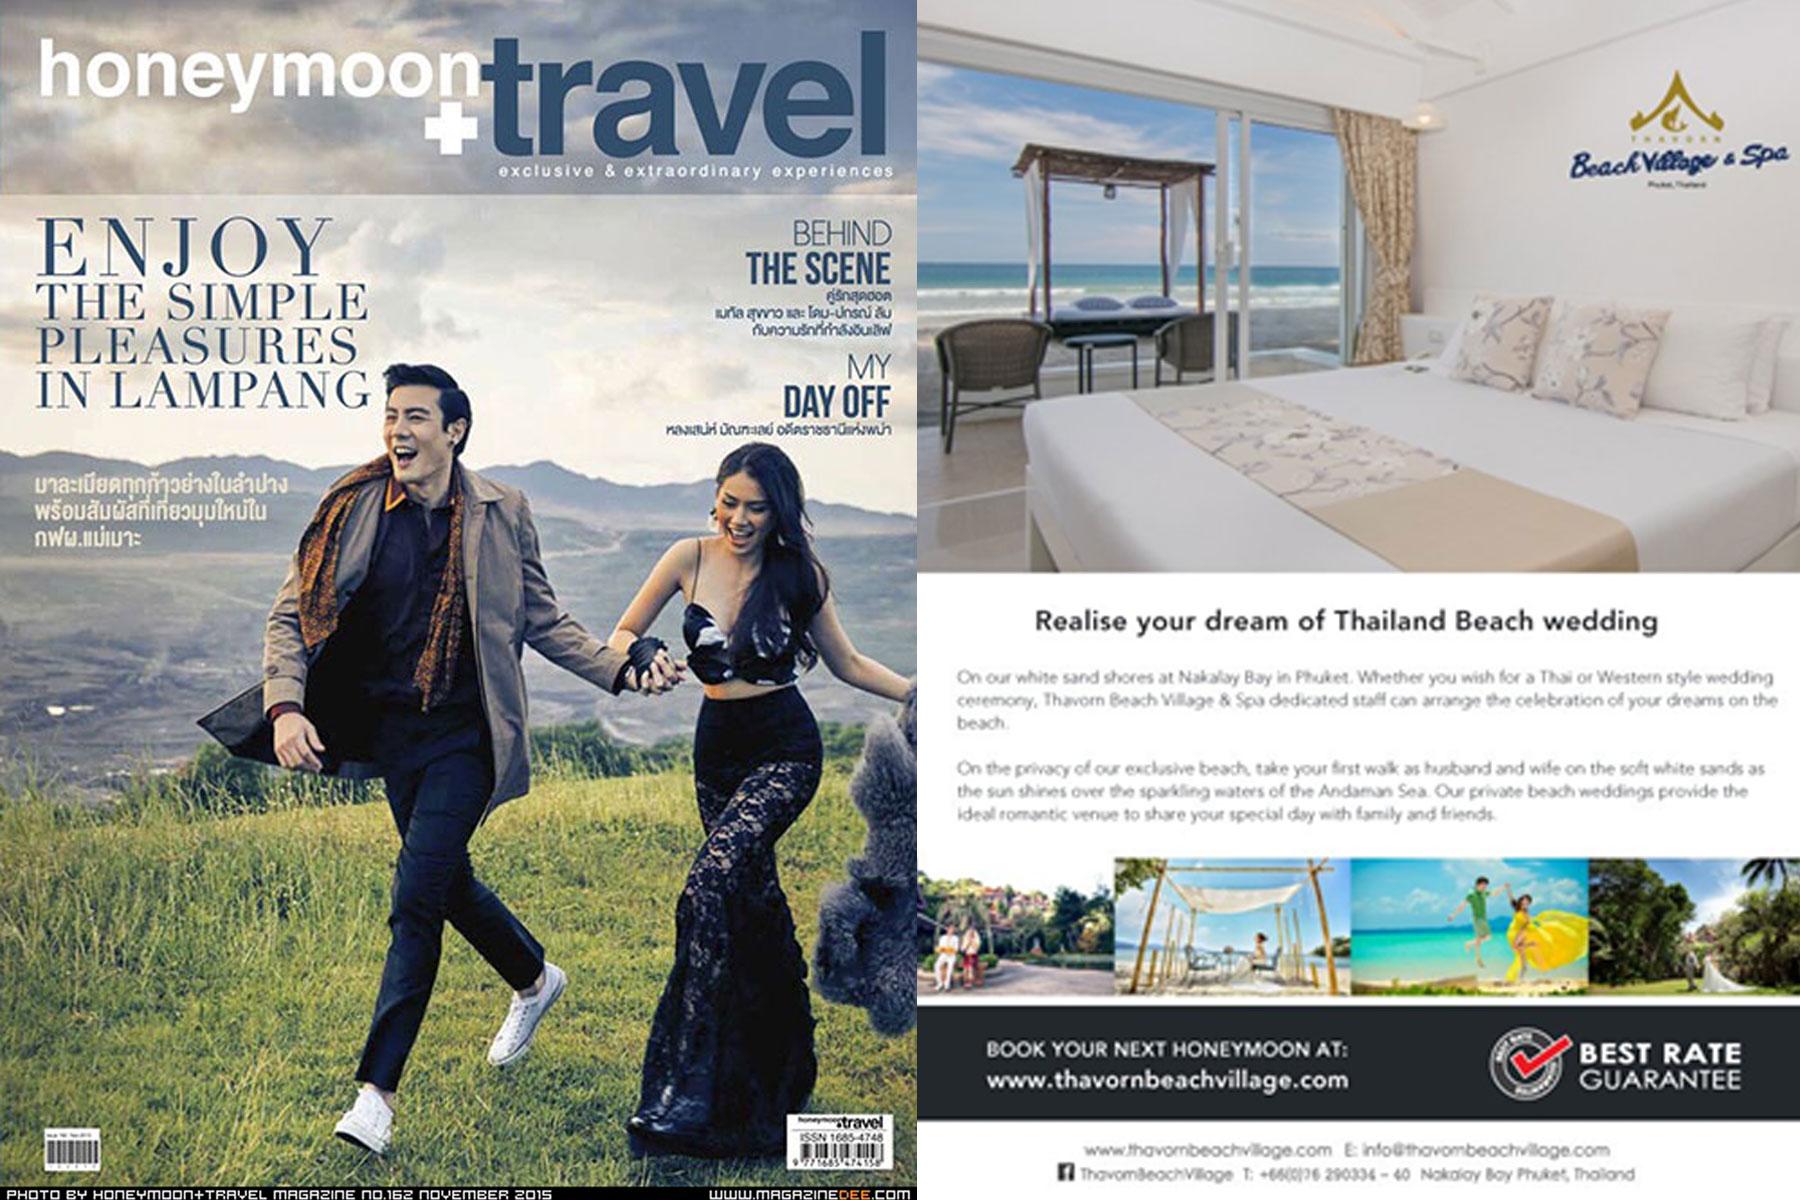 Thailand Dream Beach Wedding   Honeymoon Travel